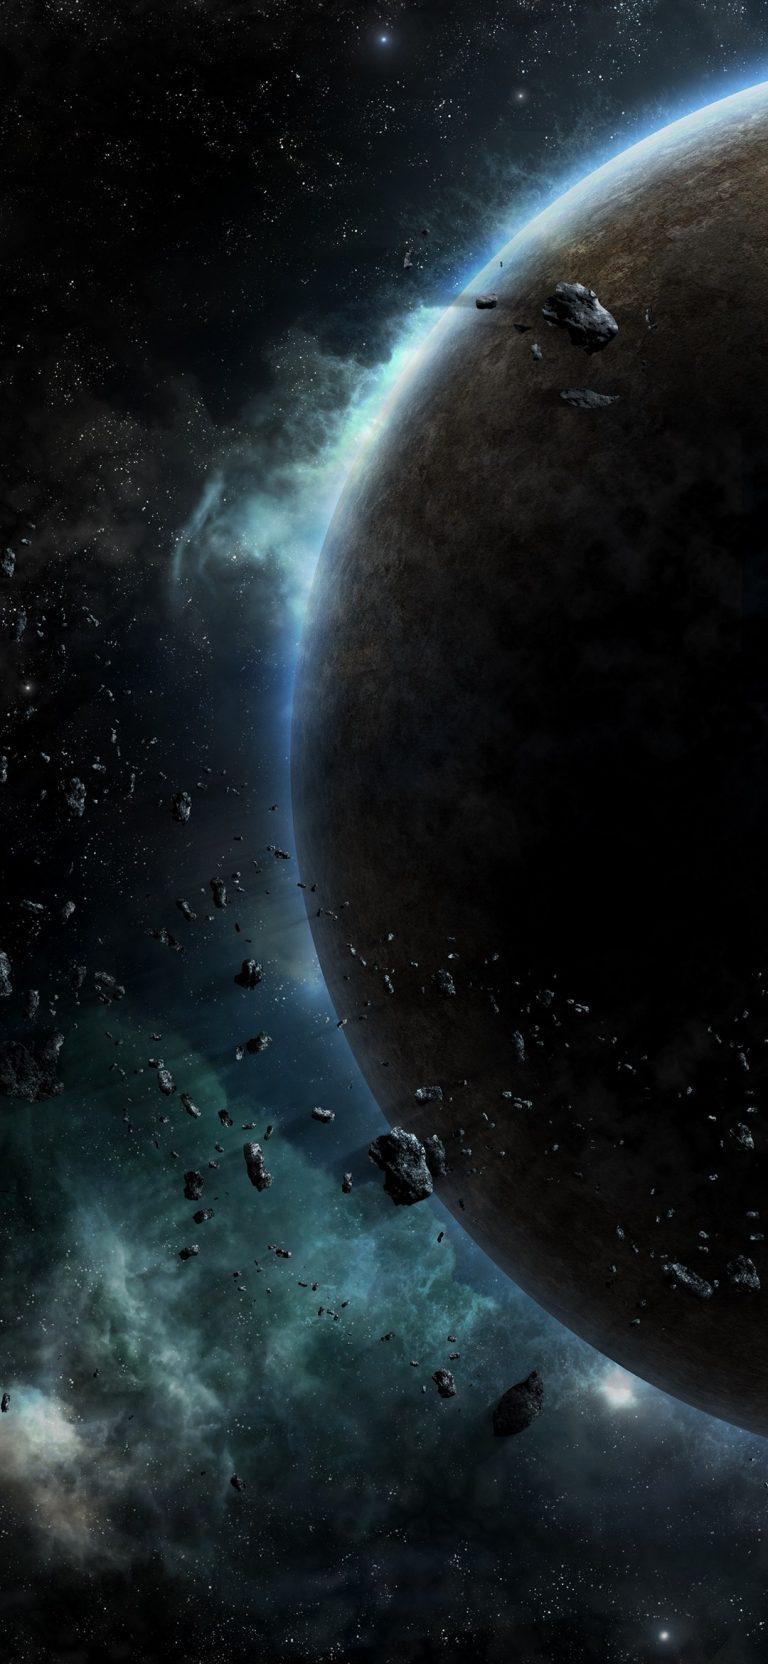 Space Phone Wallpaper 146 - [1080x2340]